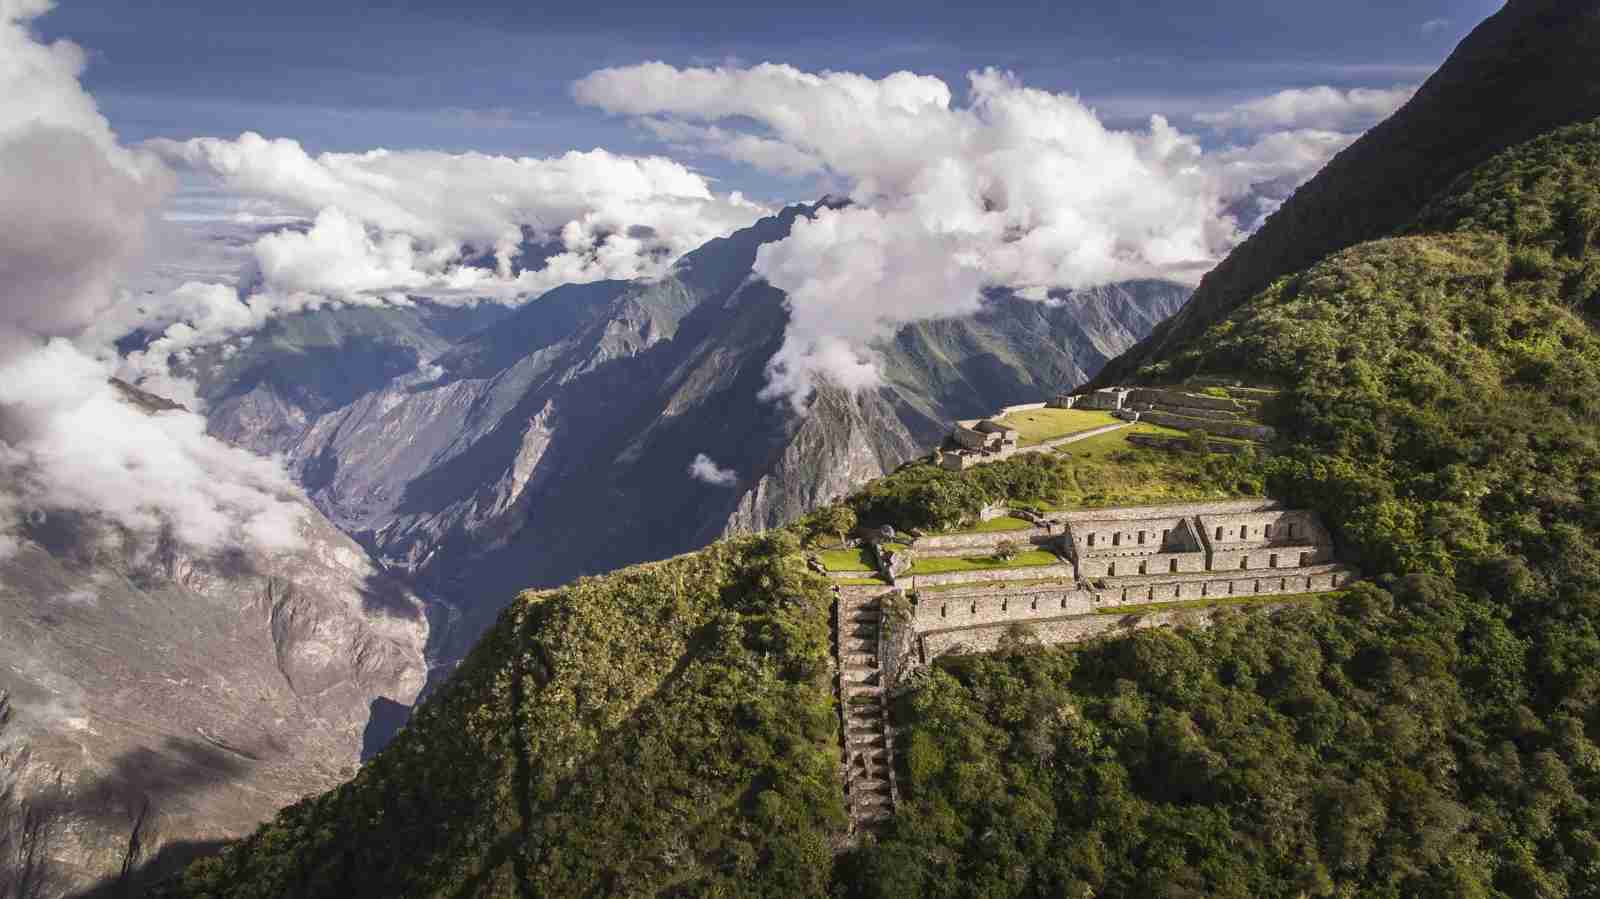 Choquequirao, an Incan site in south Peru. (Photo by Christian Declercq / Shutterstock)